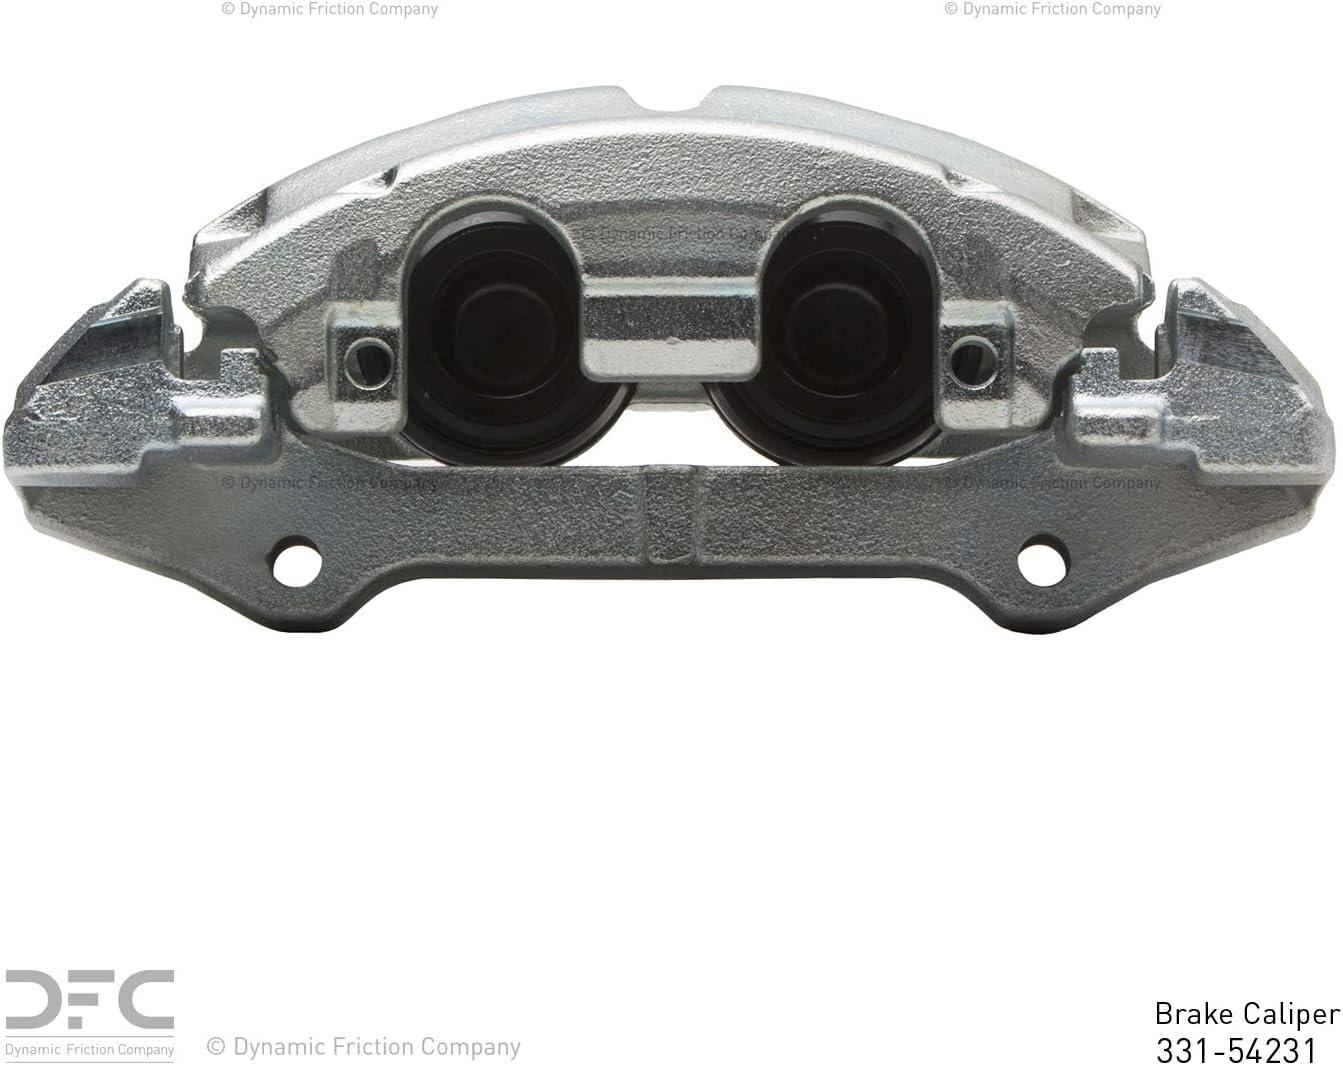 Front Left Dynamic Friction Company Premium Brake Caliper 331-54231